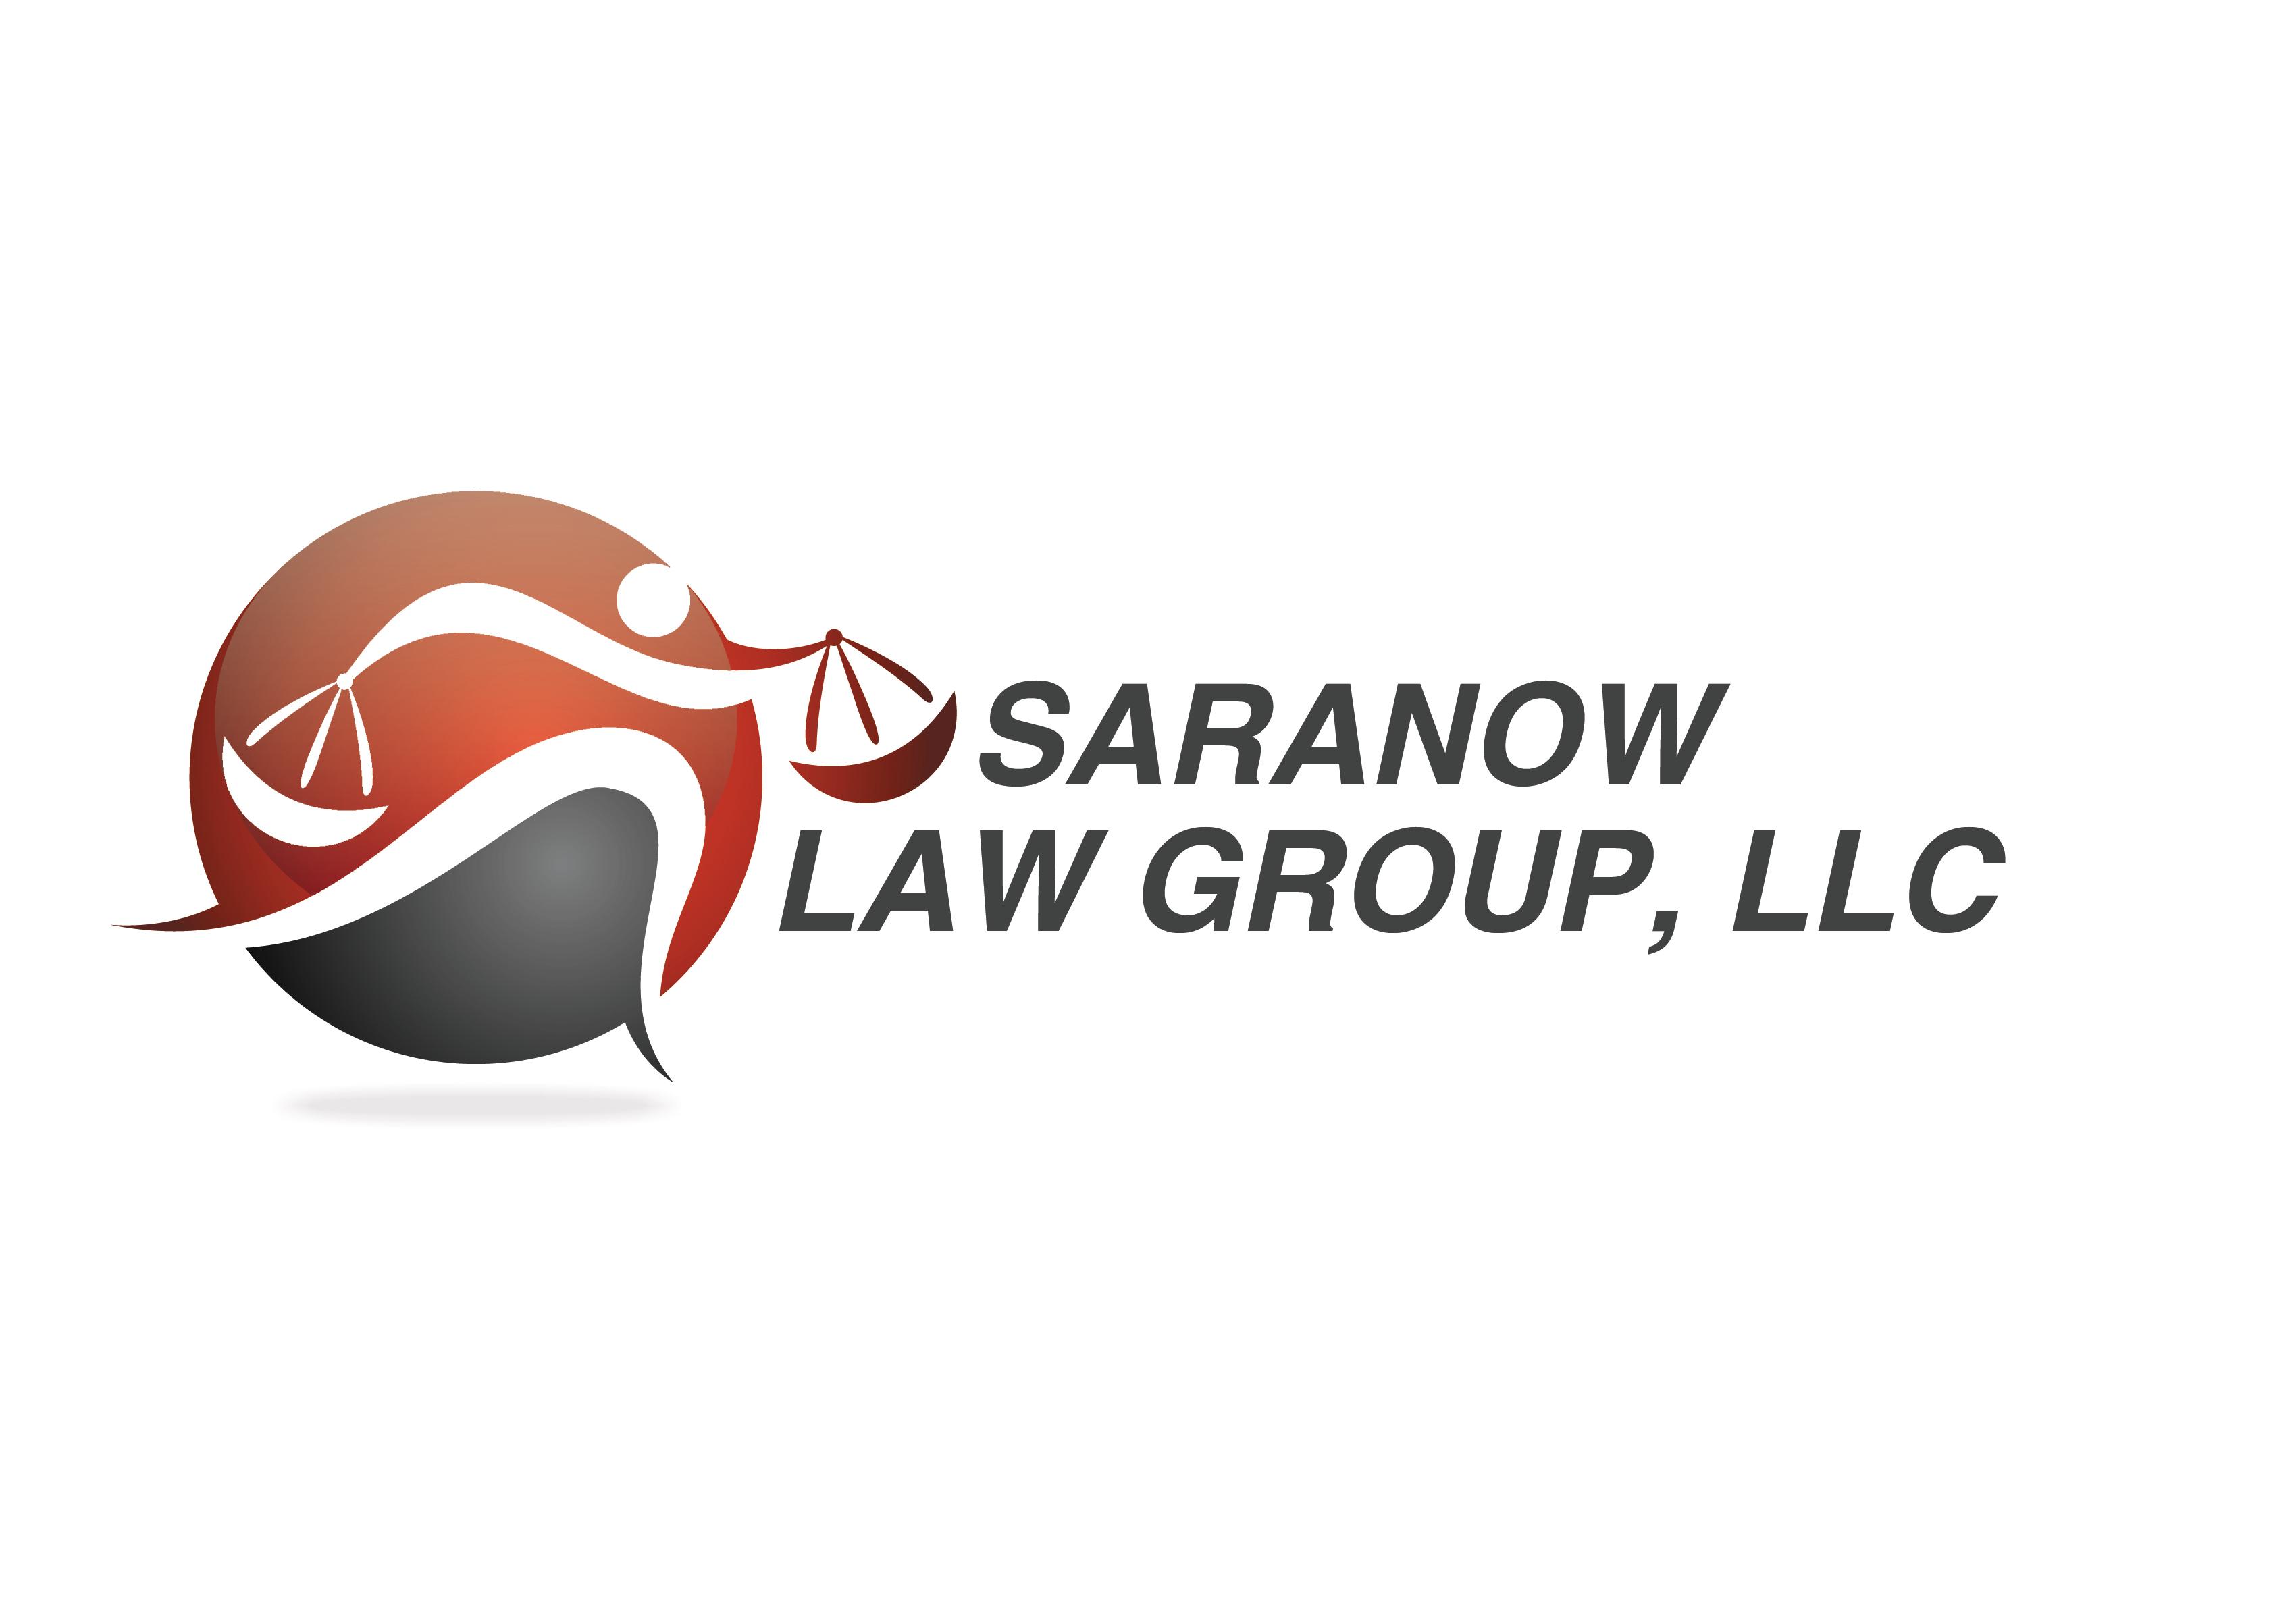 Saranow Law Group, lLC - ad image